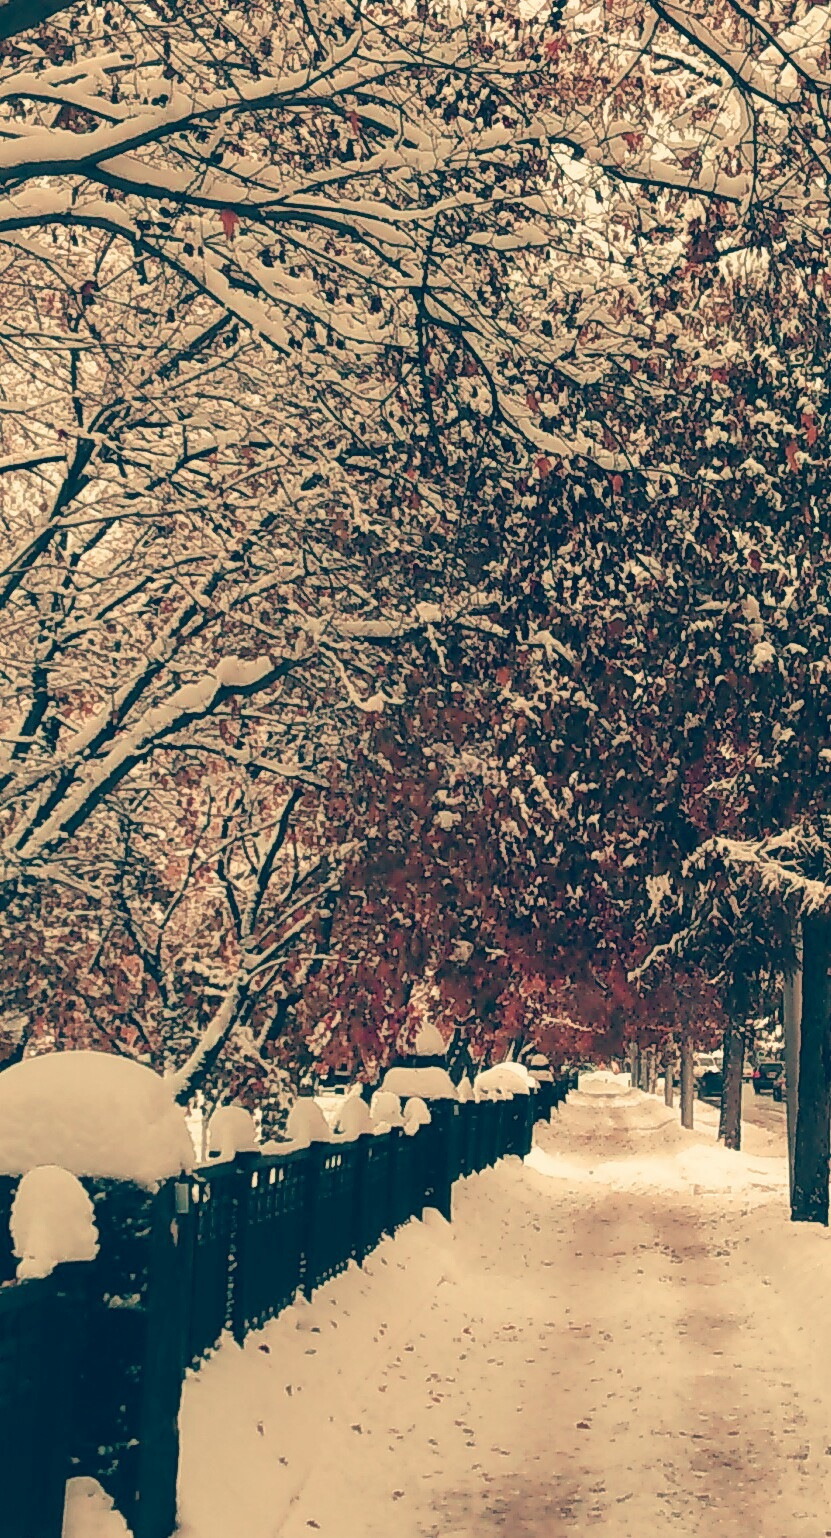 Snowfall by Lightspear